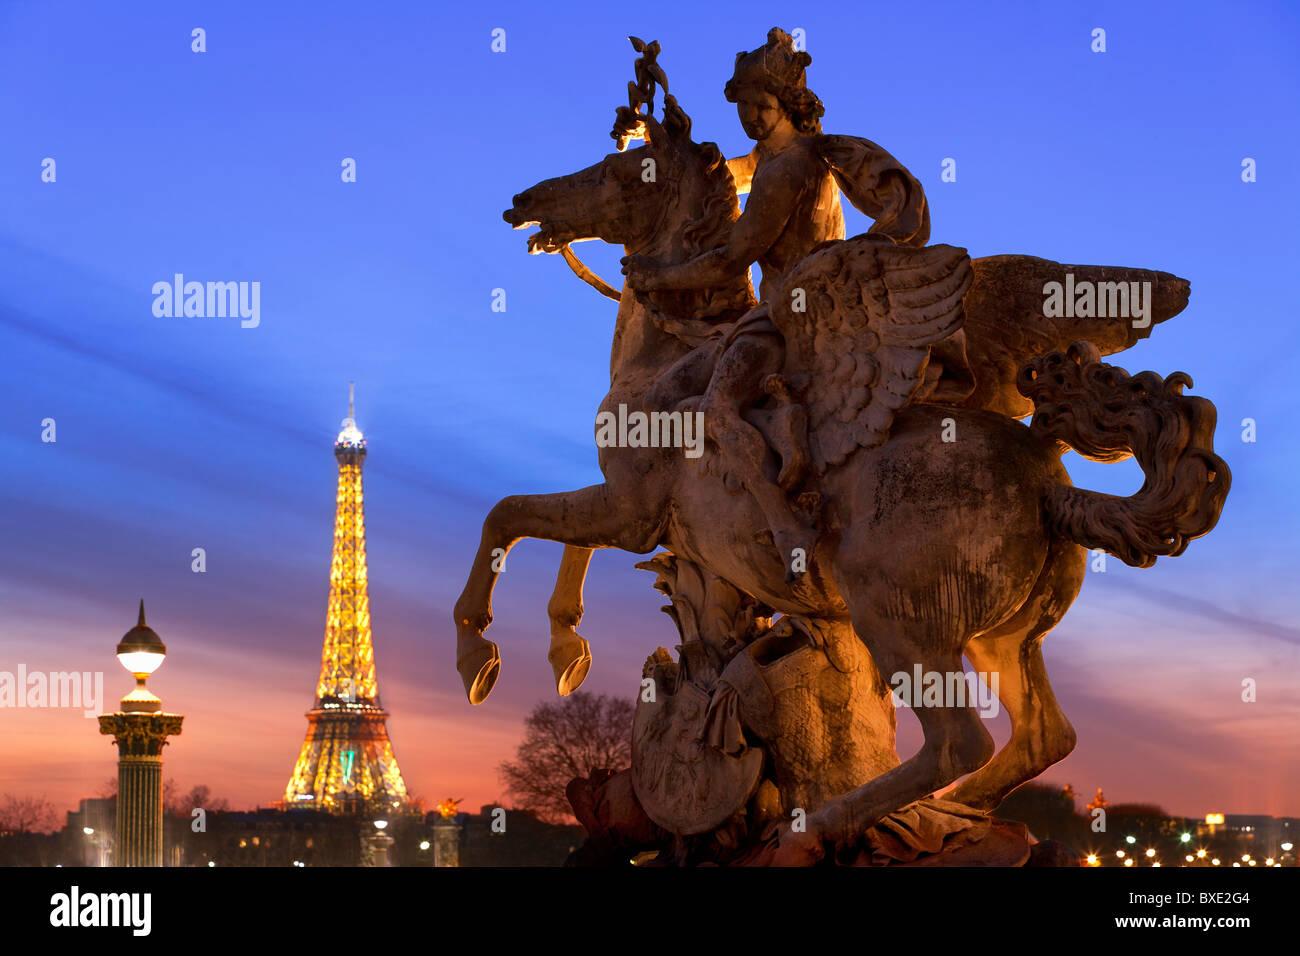 Paris, Jardin des Tuileries and Eiffel Tower - Stock Image